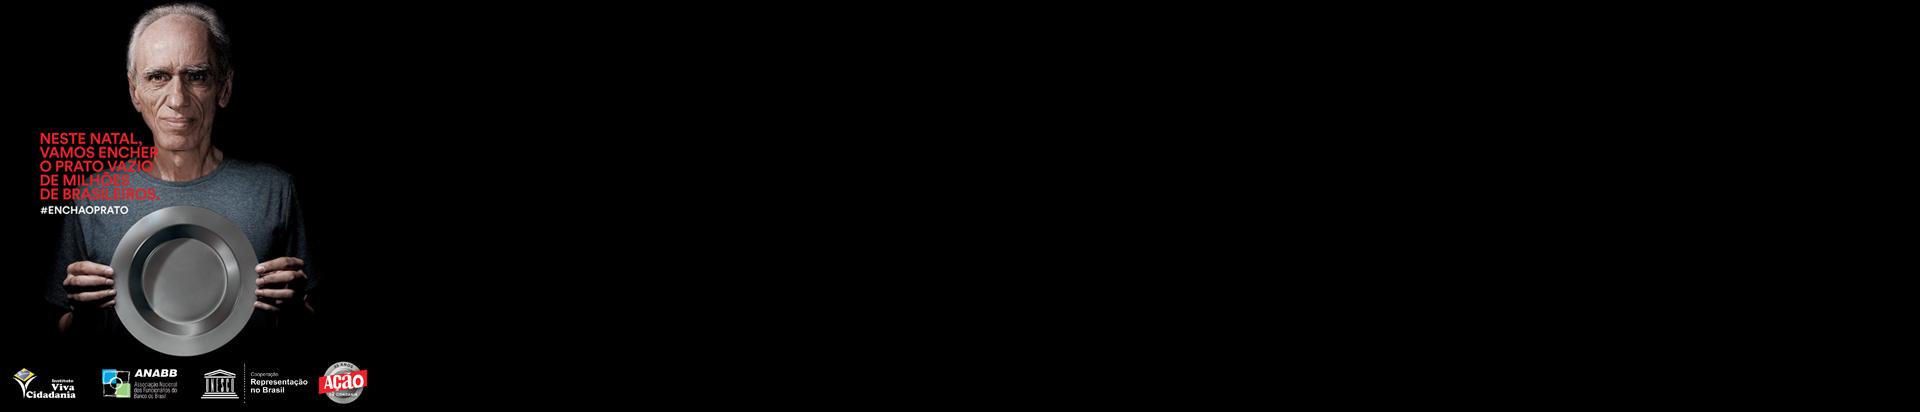 banner topo